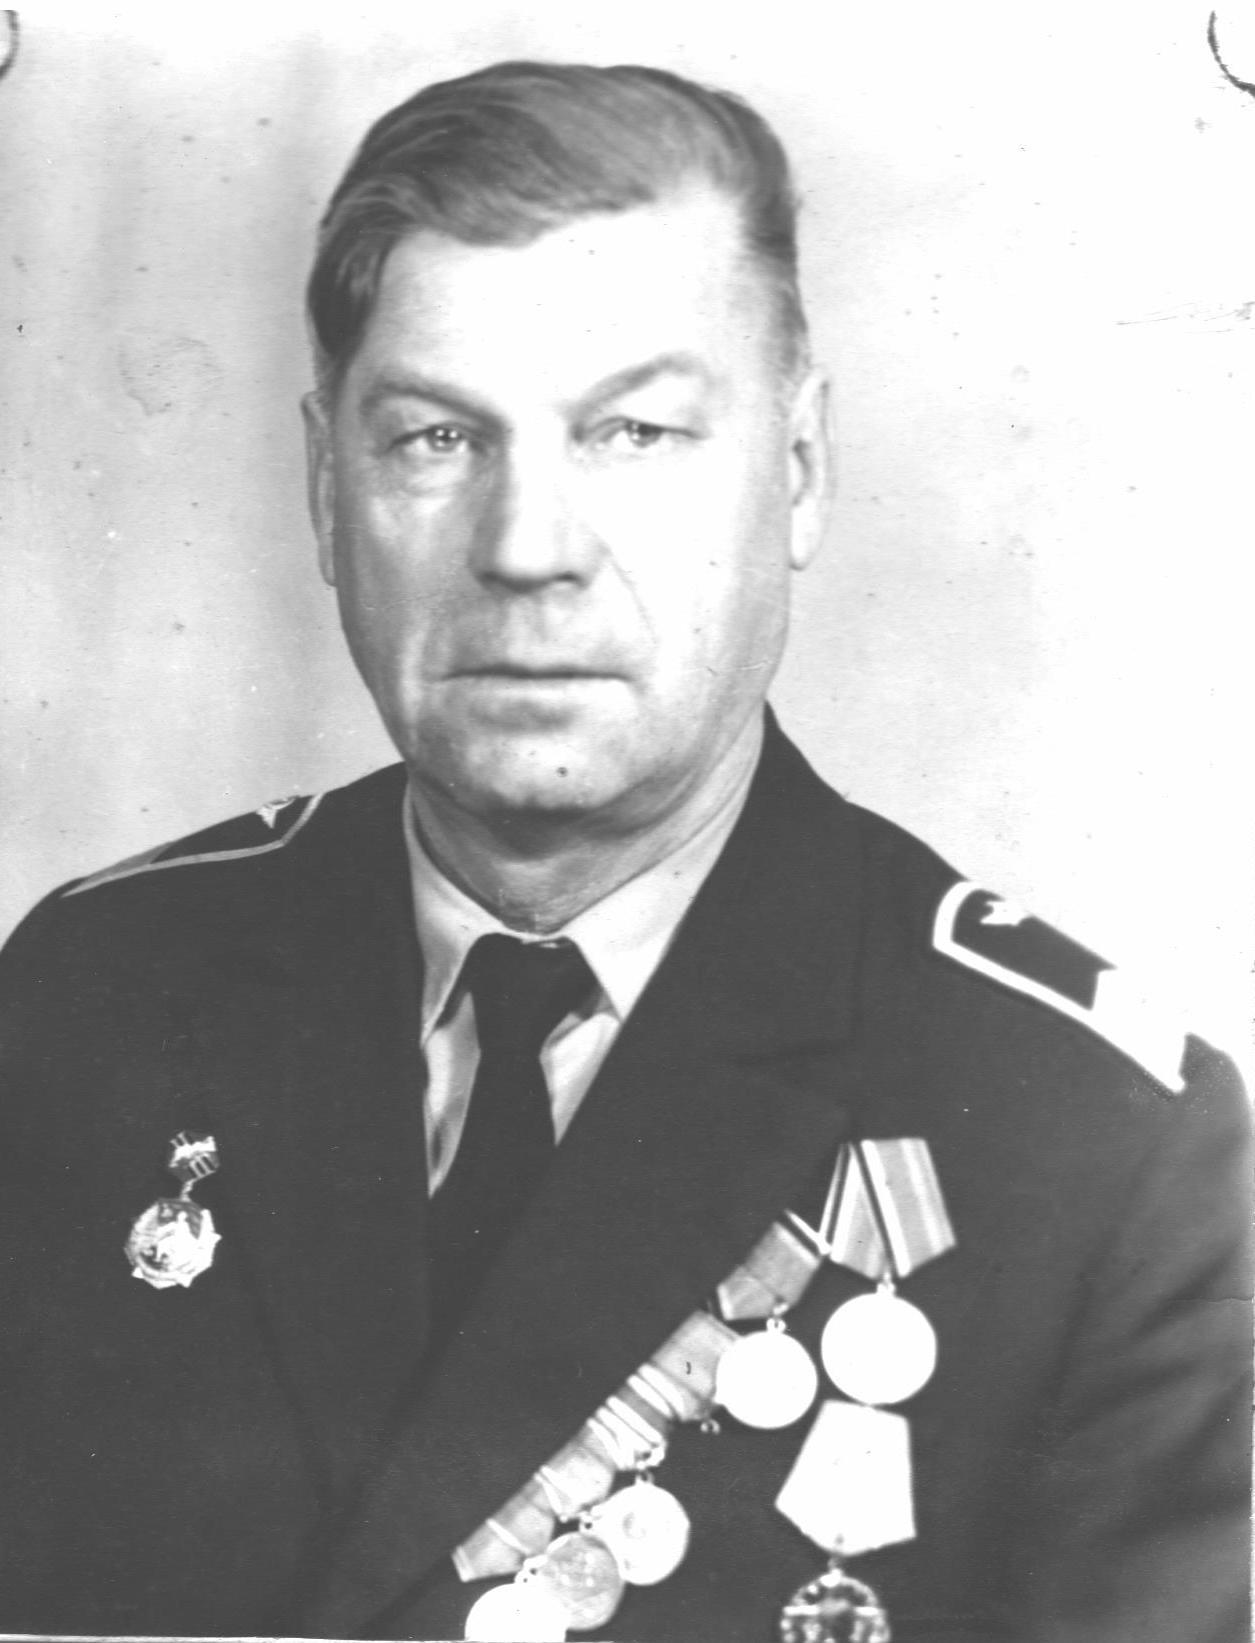 Фёдоров Сергей Фёдорович